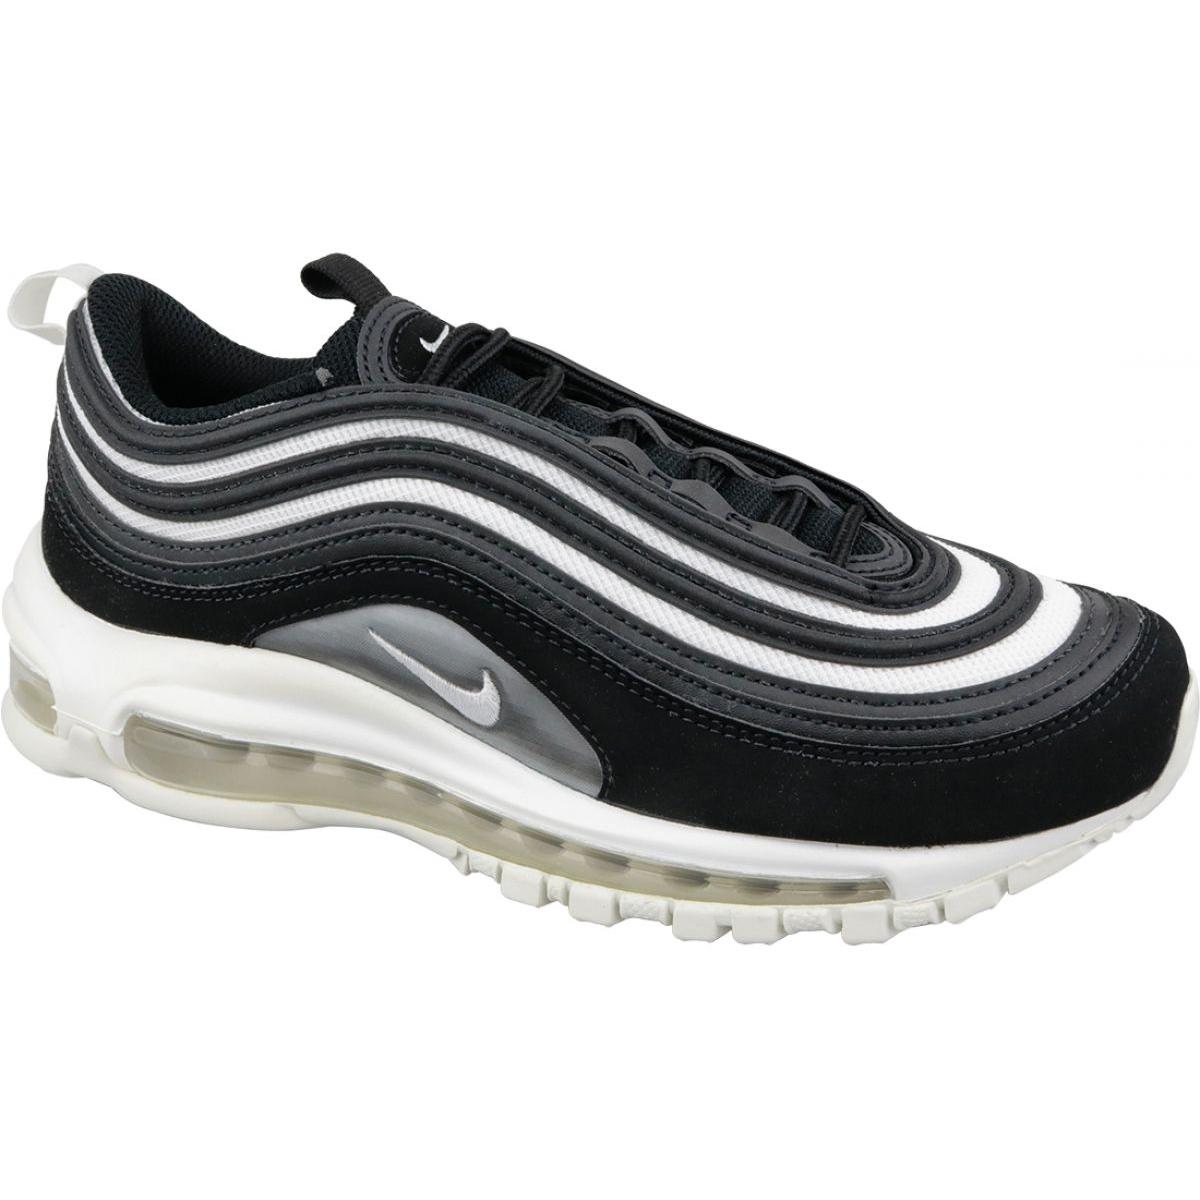 Negro Nike Wmns Air Max 97 W Calzado 921733 017